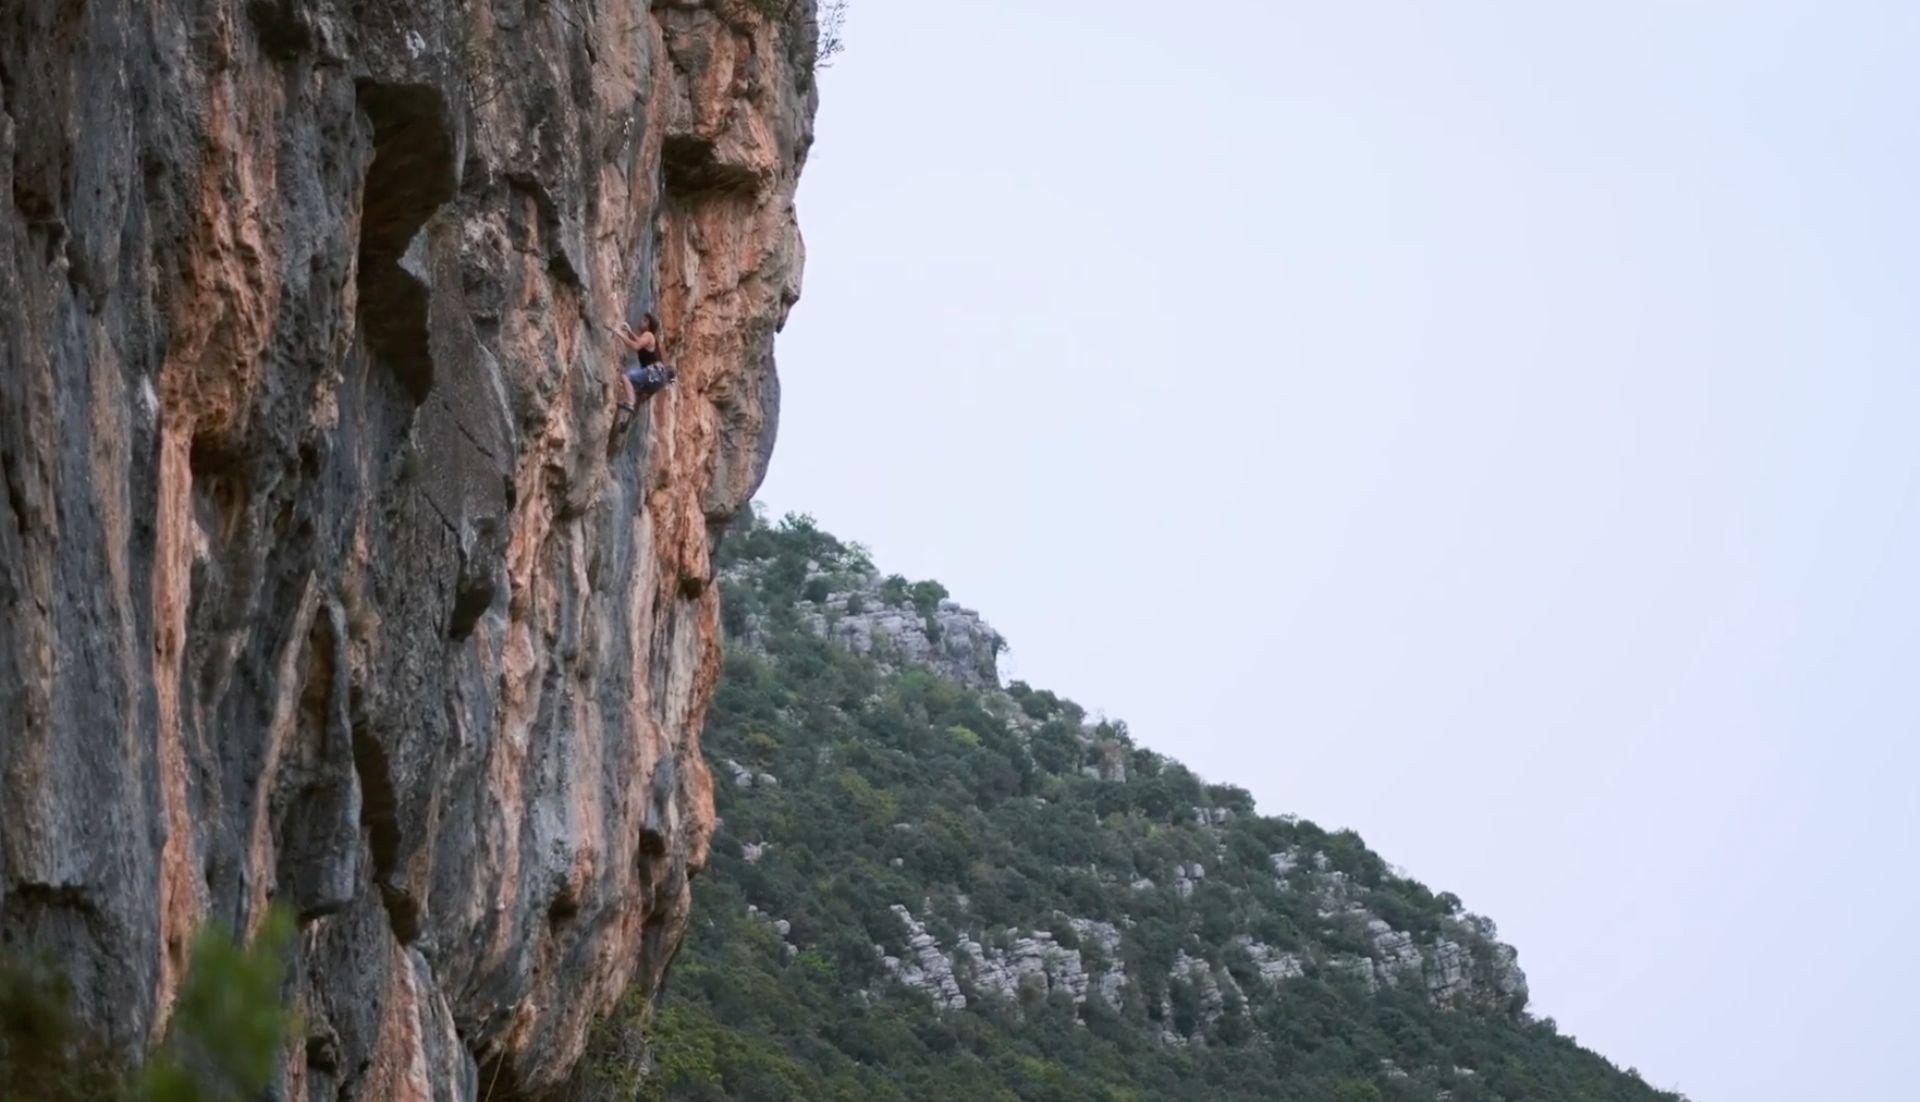 Klettern video Montenegro